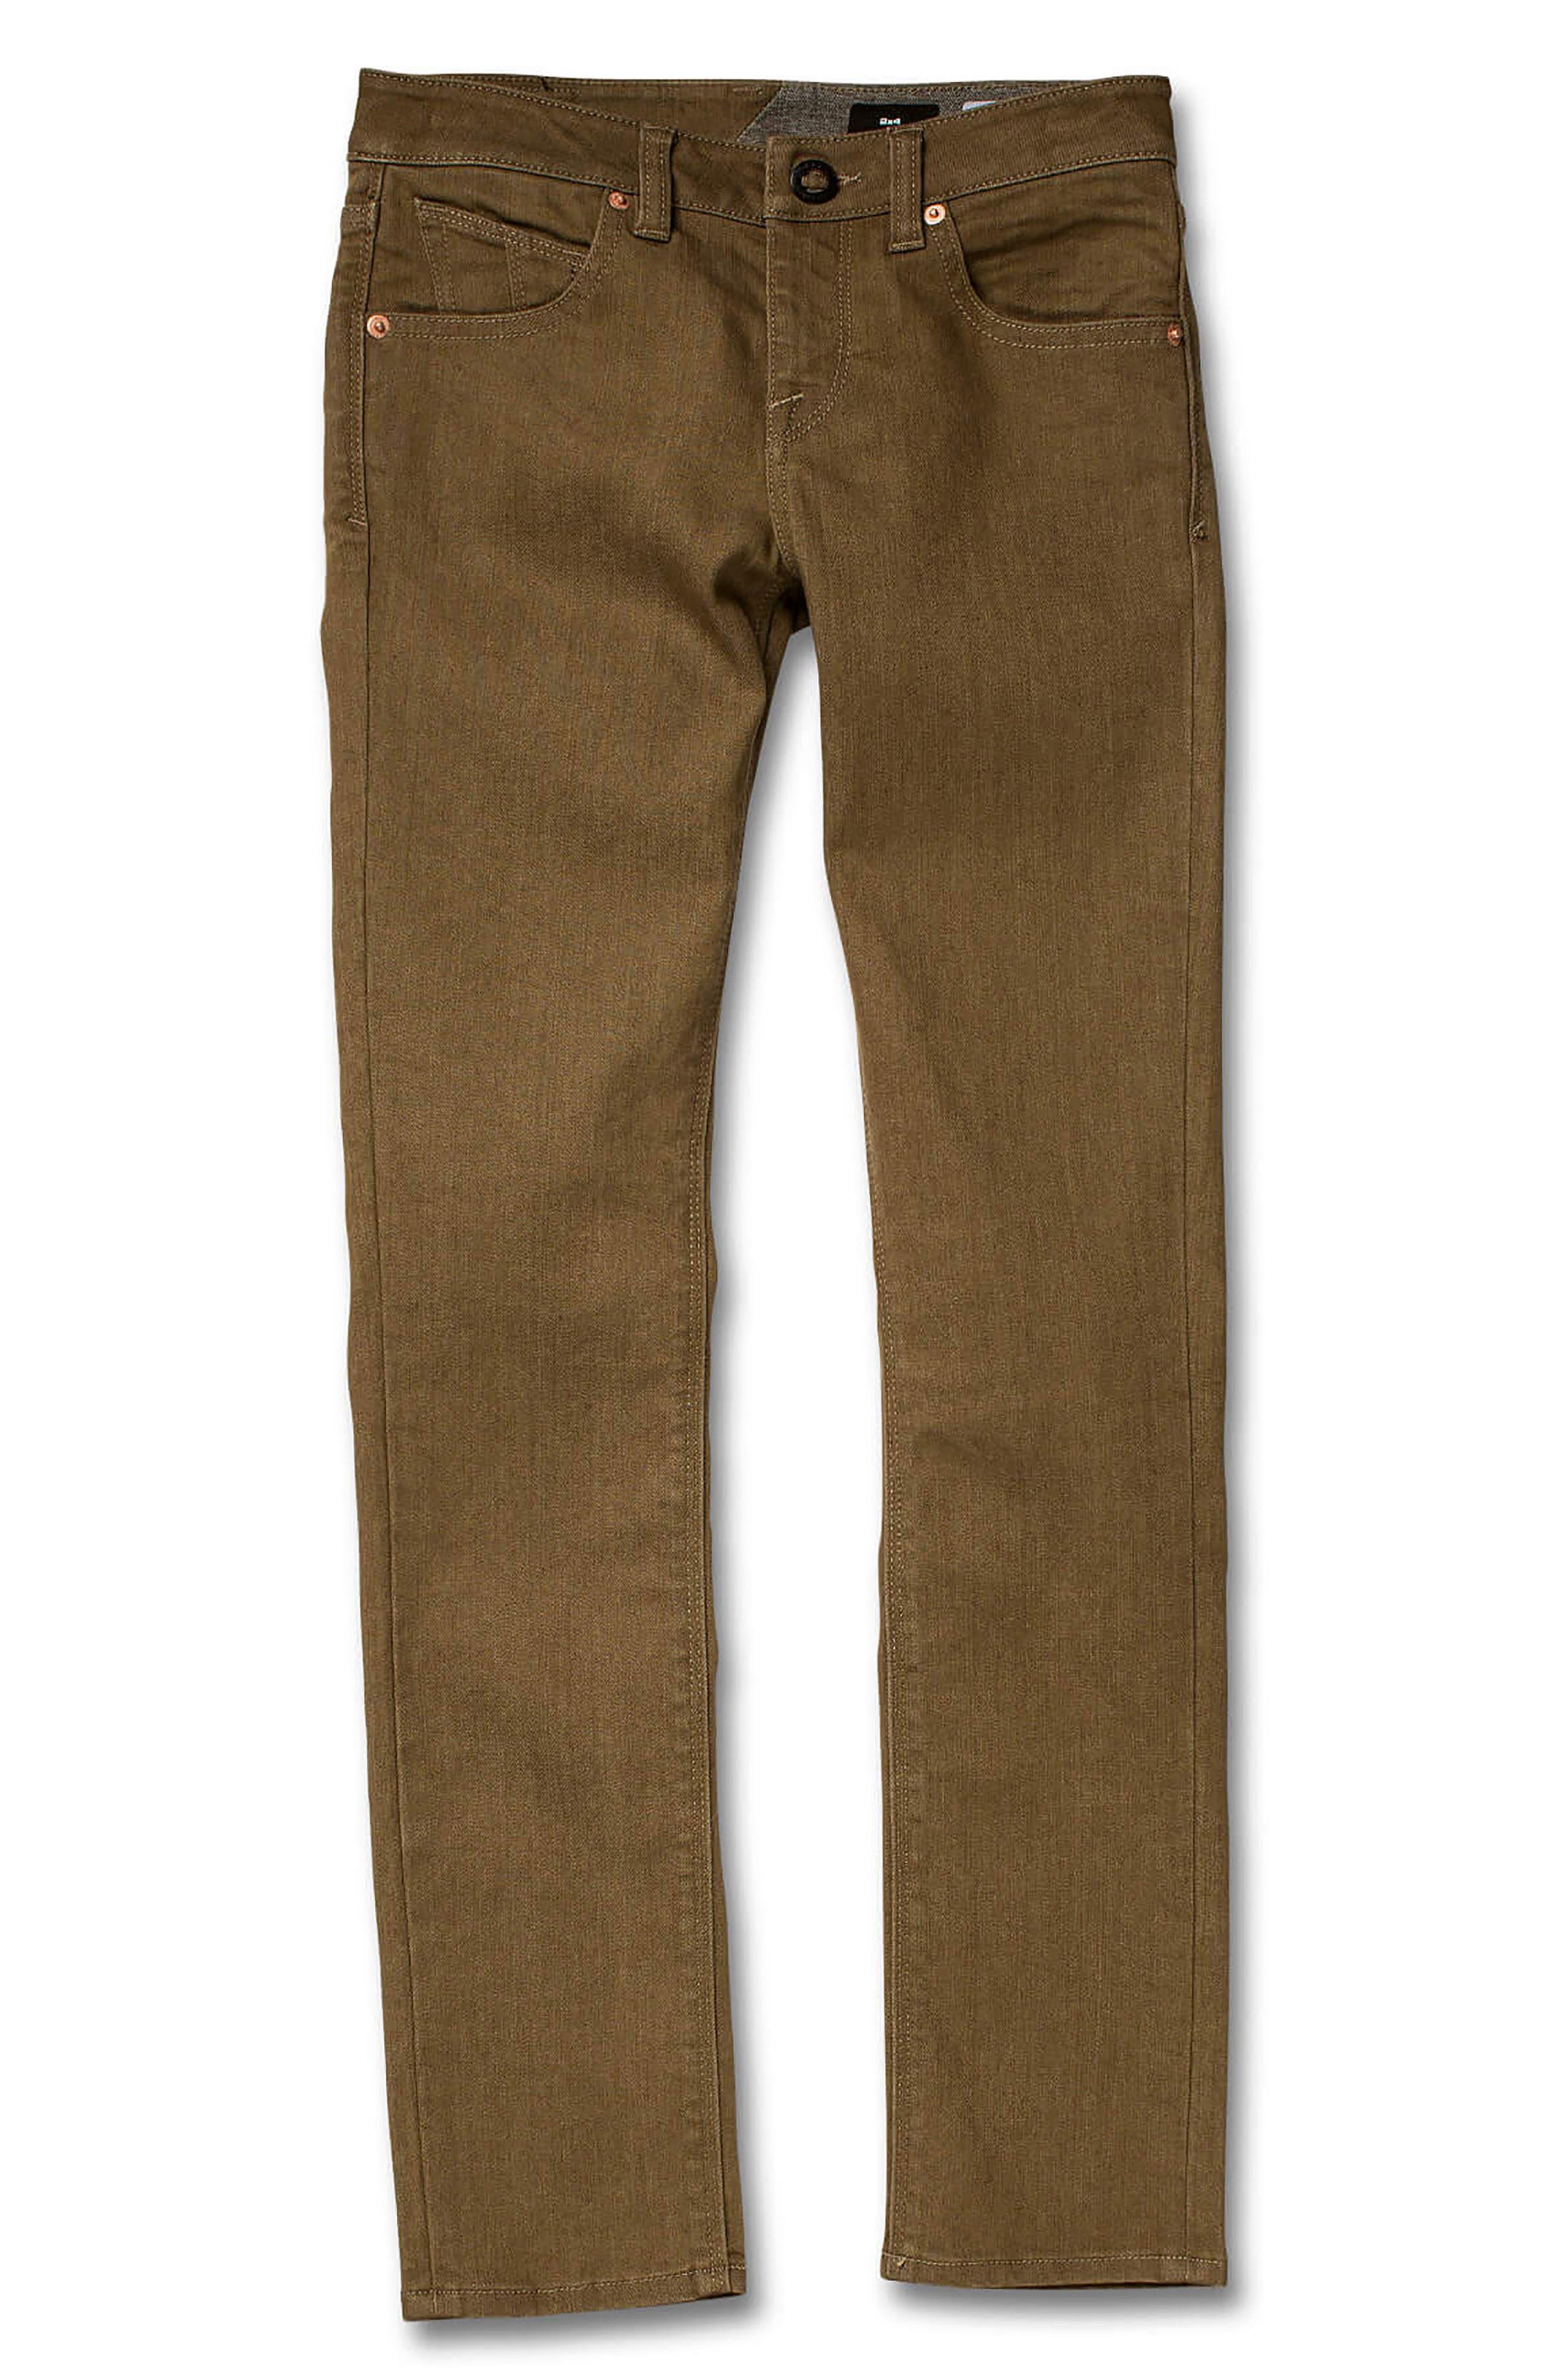 VOLCOM '2x4' Skinny Jeans, Main, color, WET SAND